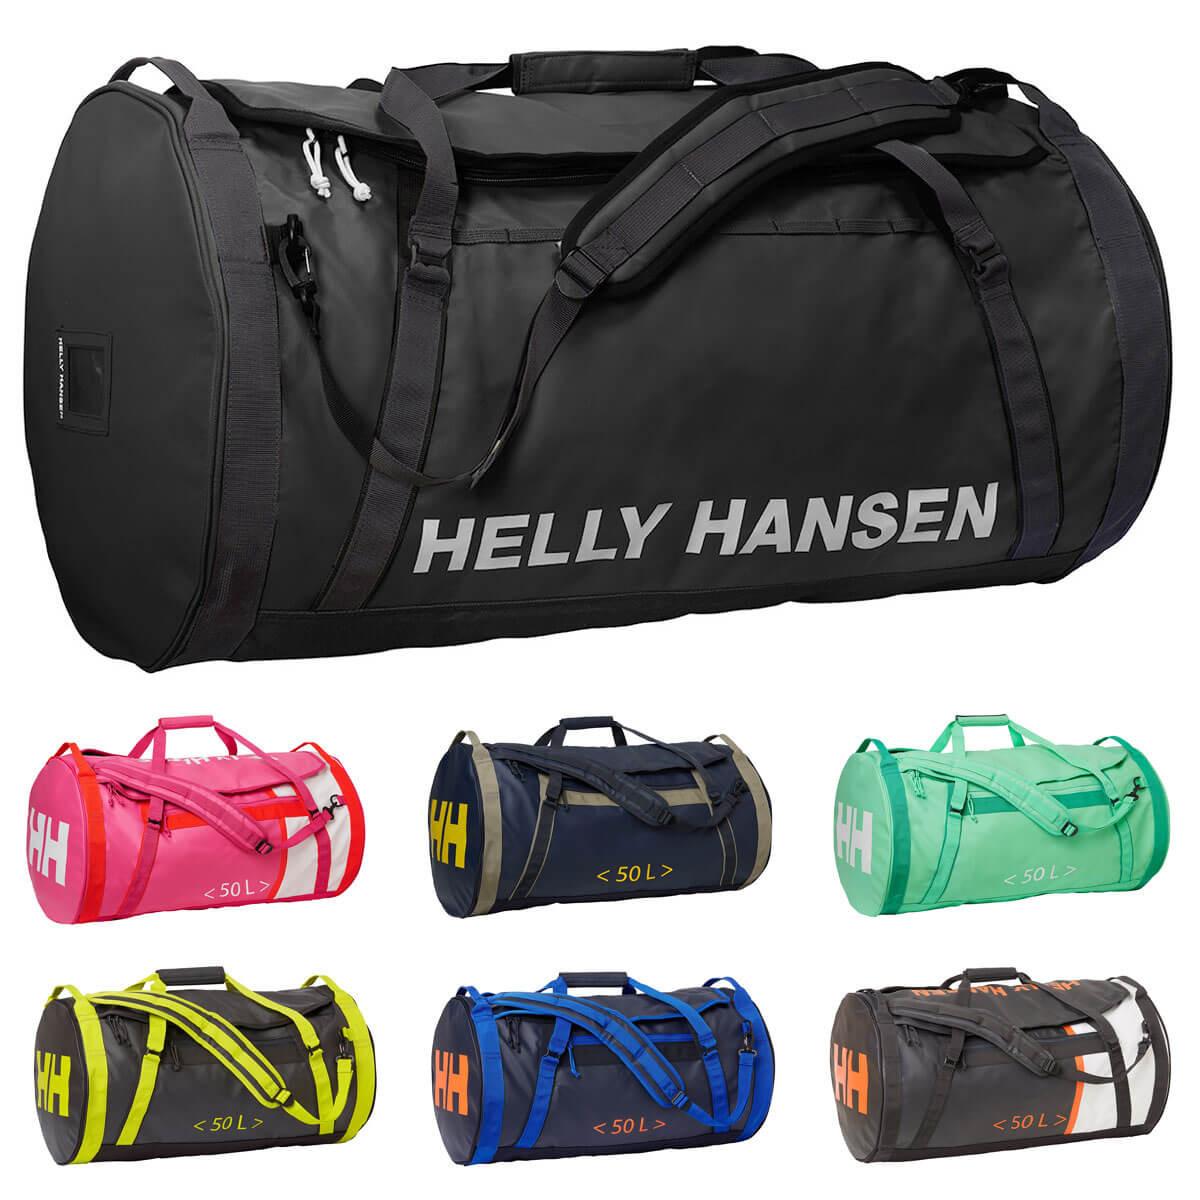 08249cccc5 Helly Hansen 2019 HH Duffel Bag 2 50L Holdall - Tree Present